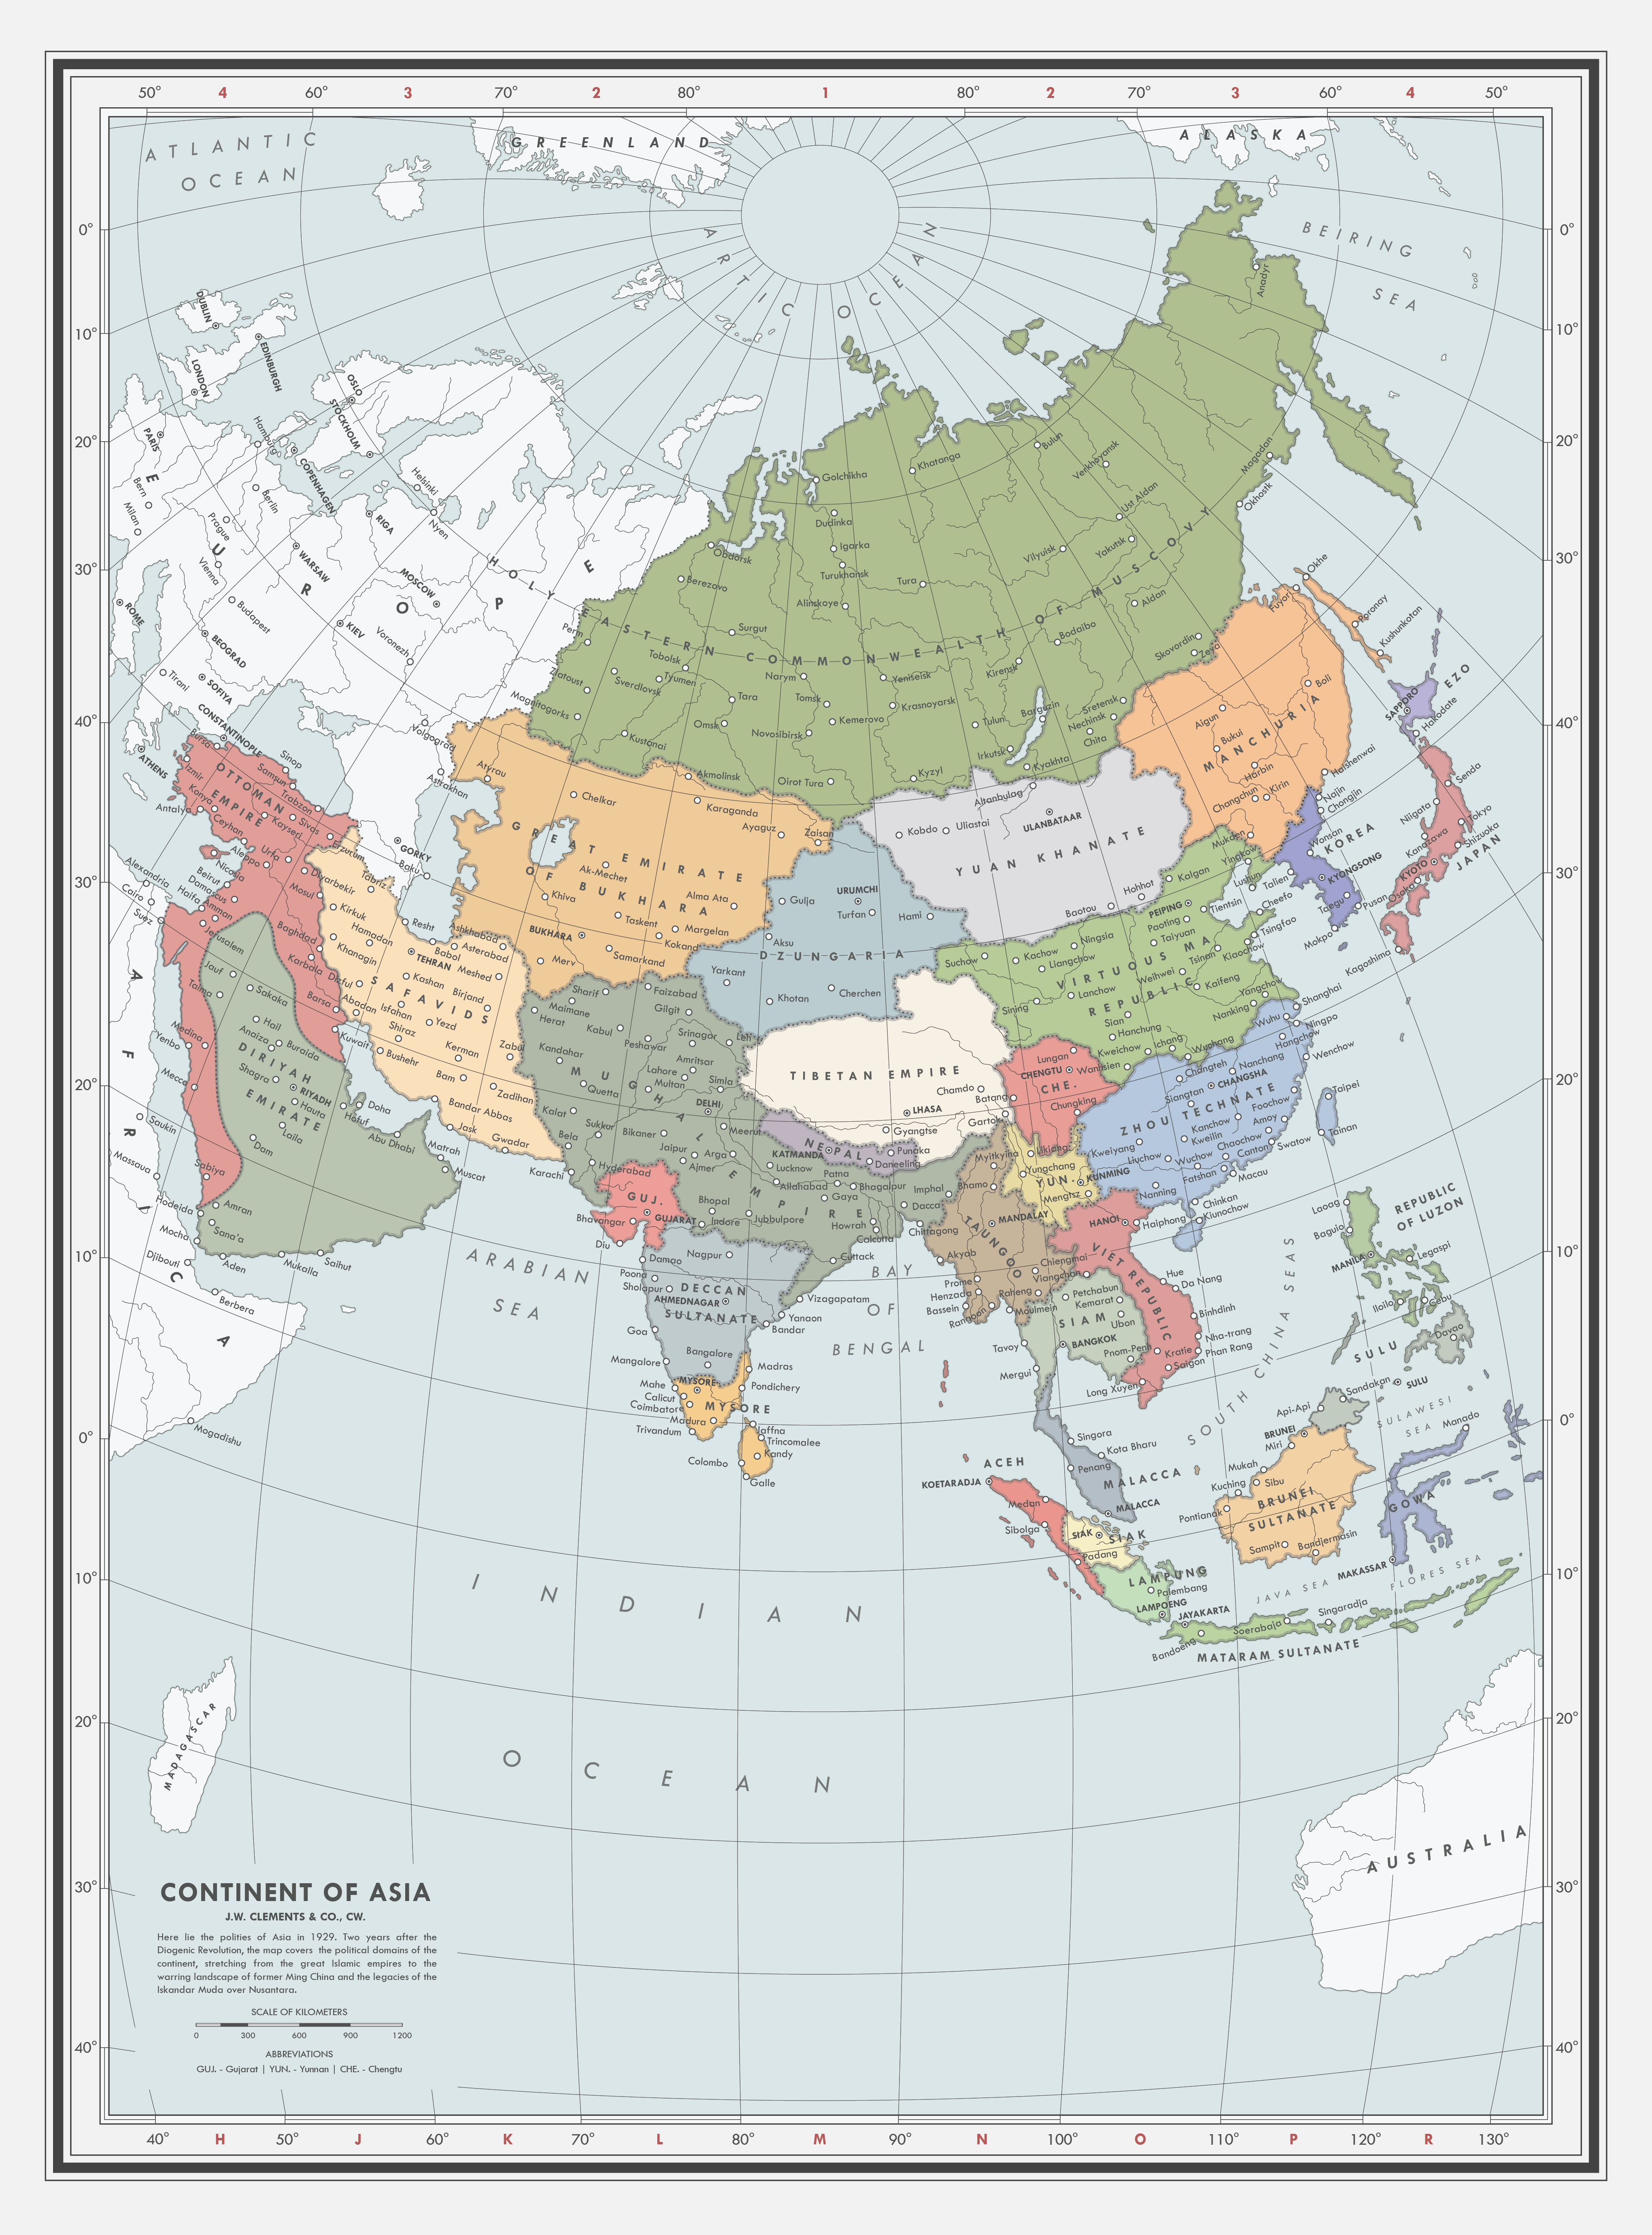 Alt-Asian_Map.png